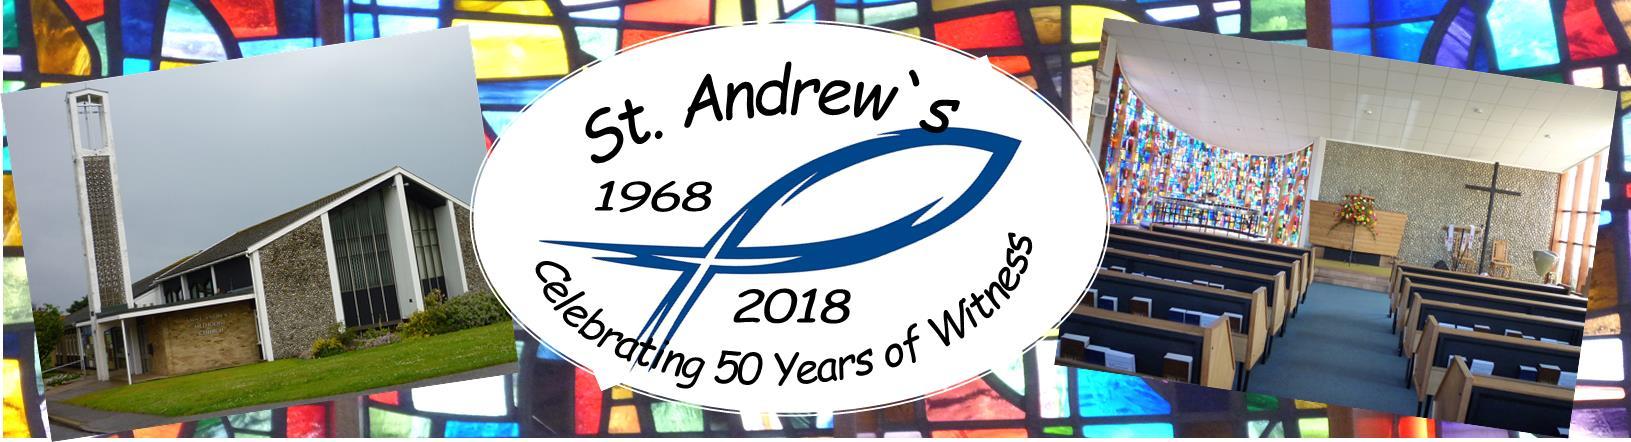 St. Andrews Anniversary header